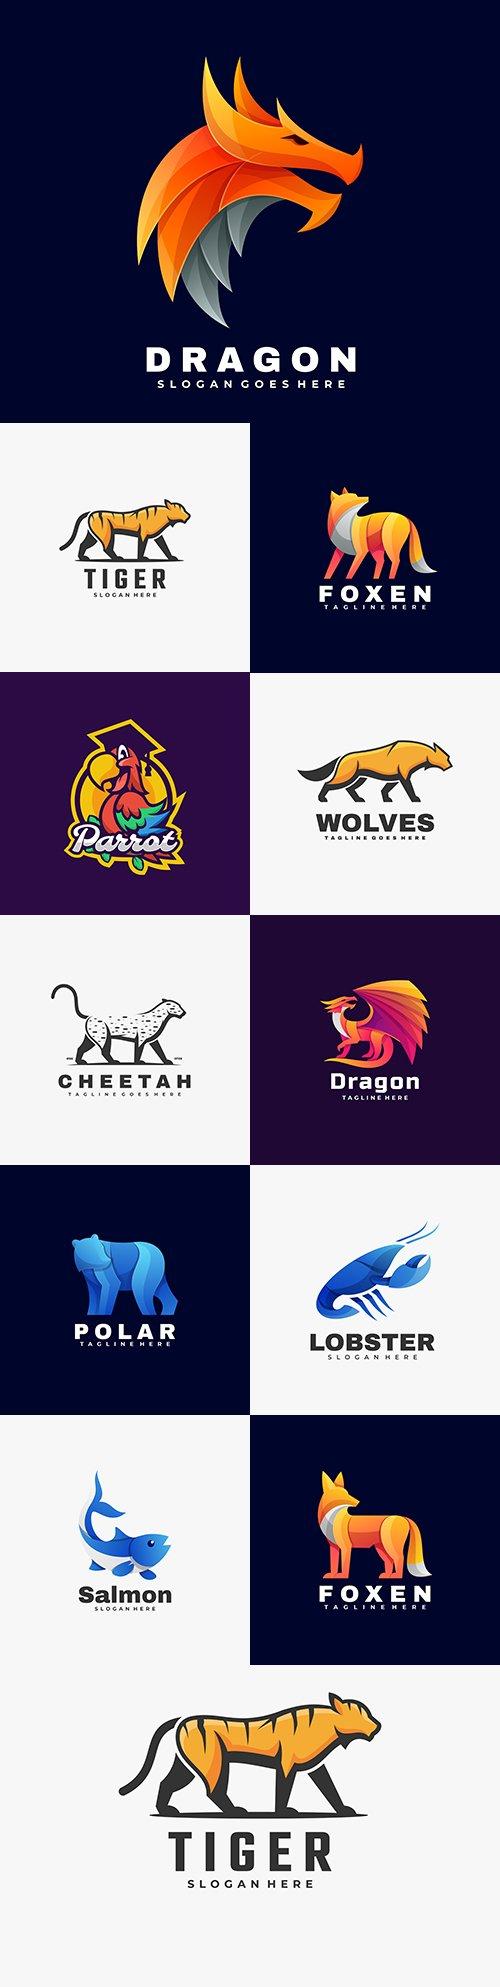 Brand name company logos business corporate design 17